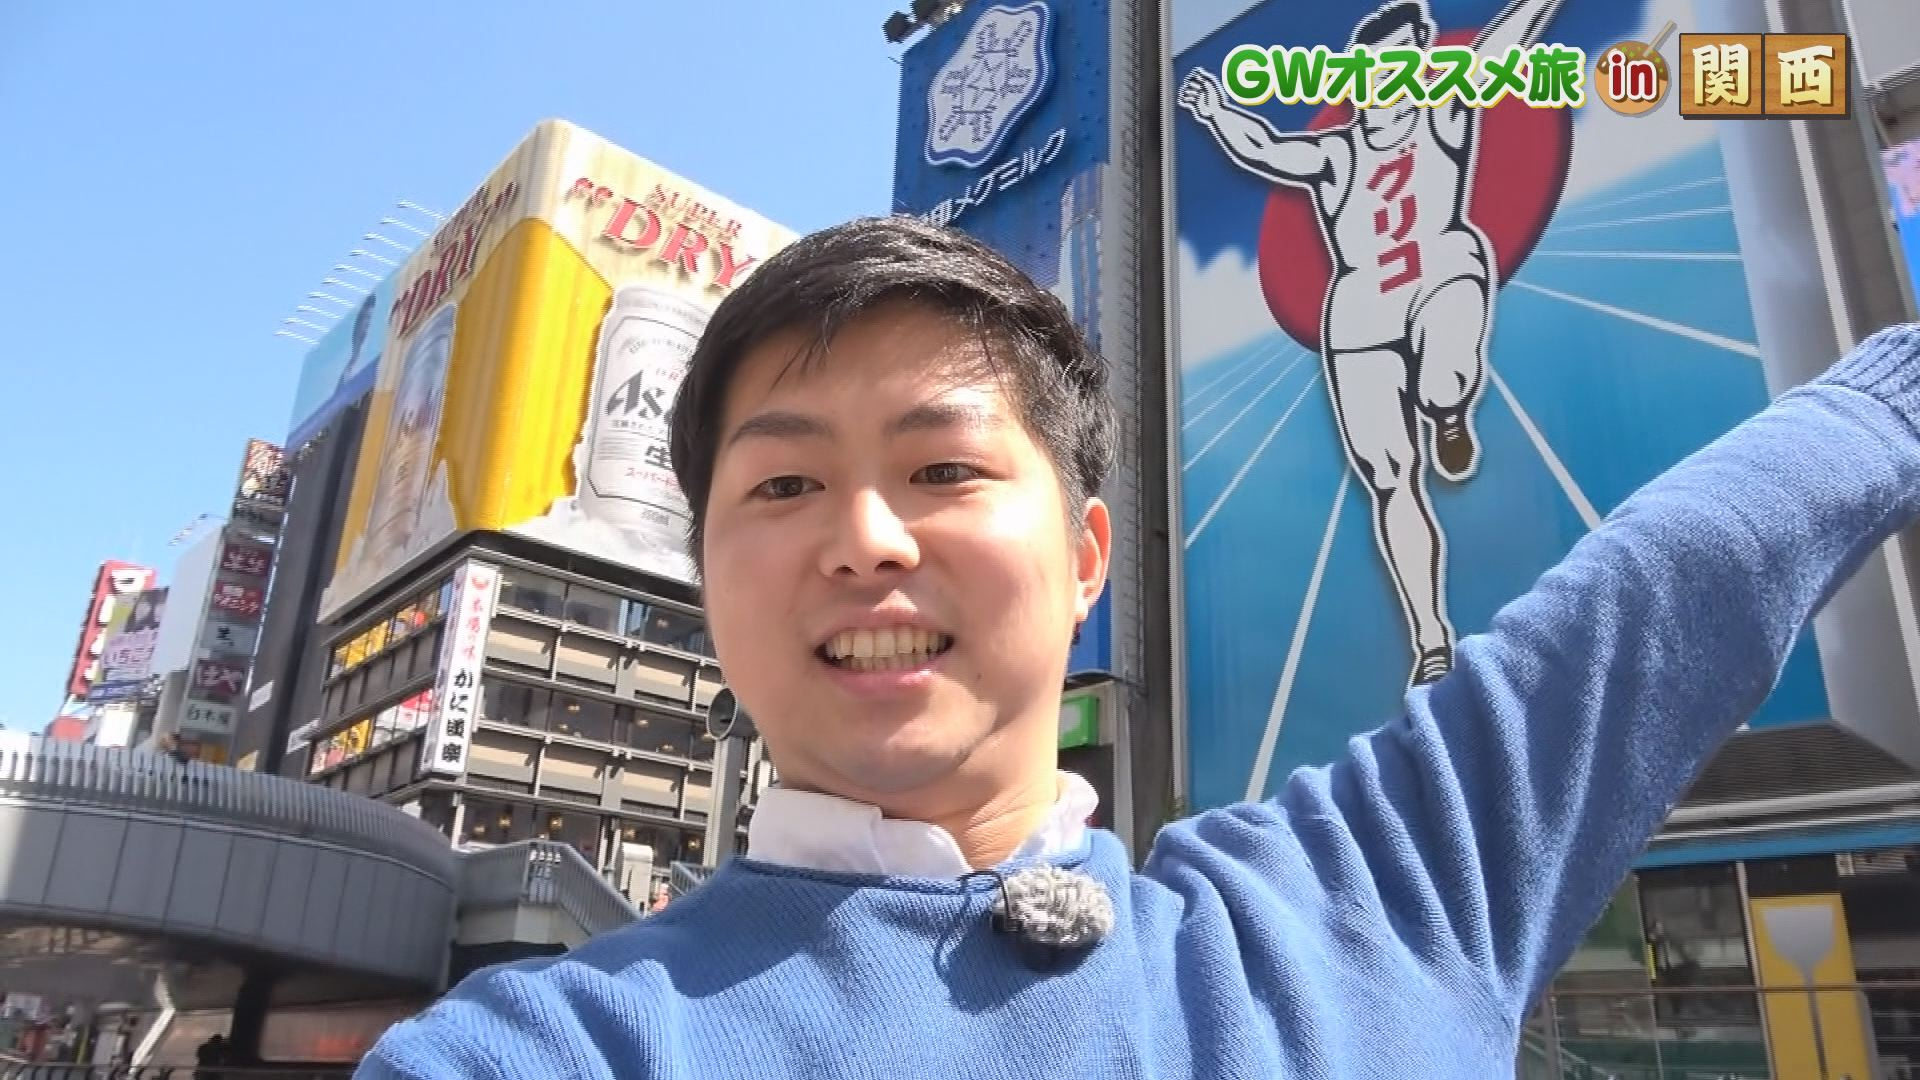 GWオススメ旅 in関西